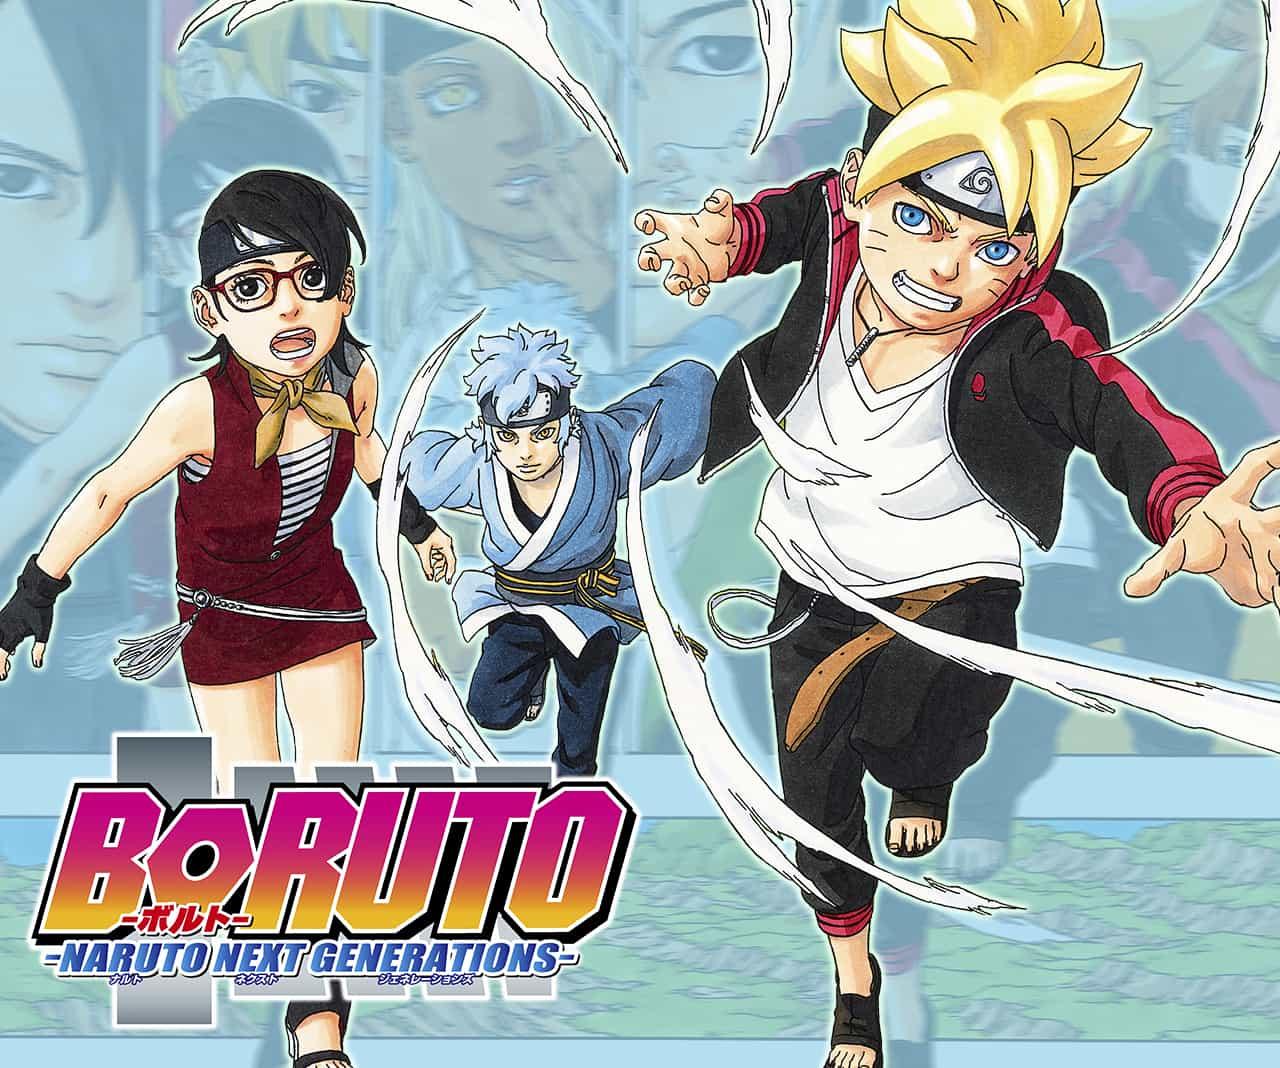 Daftar Chapter Boruto: Naruto Next Generation